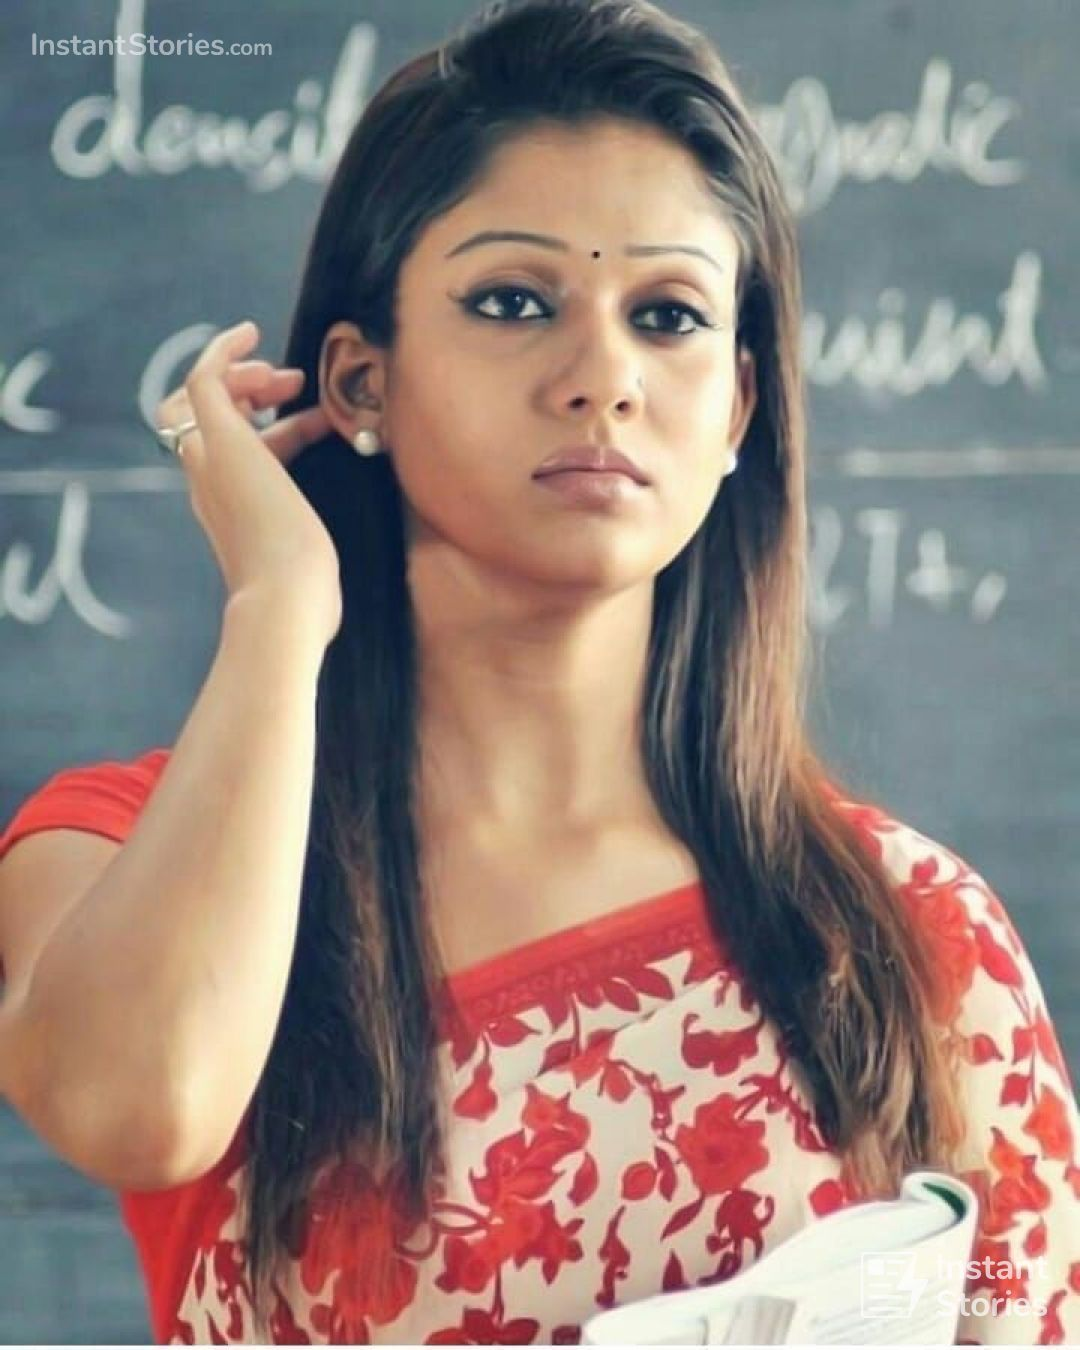 Nayanthara Hd Wallpapers 1080p 4k In 2020 Hd Wallpapers 1080p Hd Photos Nayanthara Hairstyle